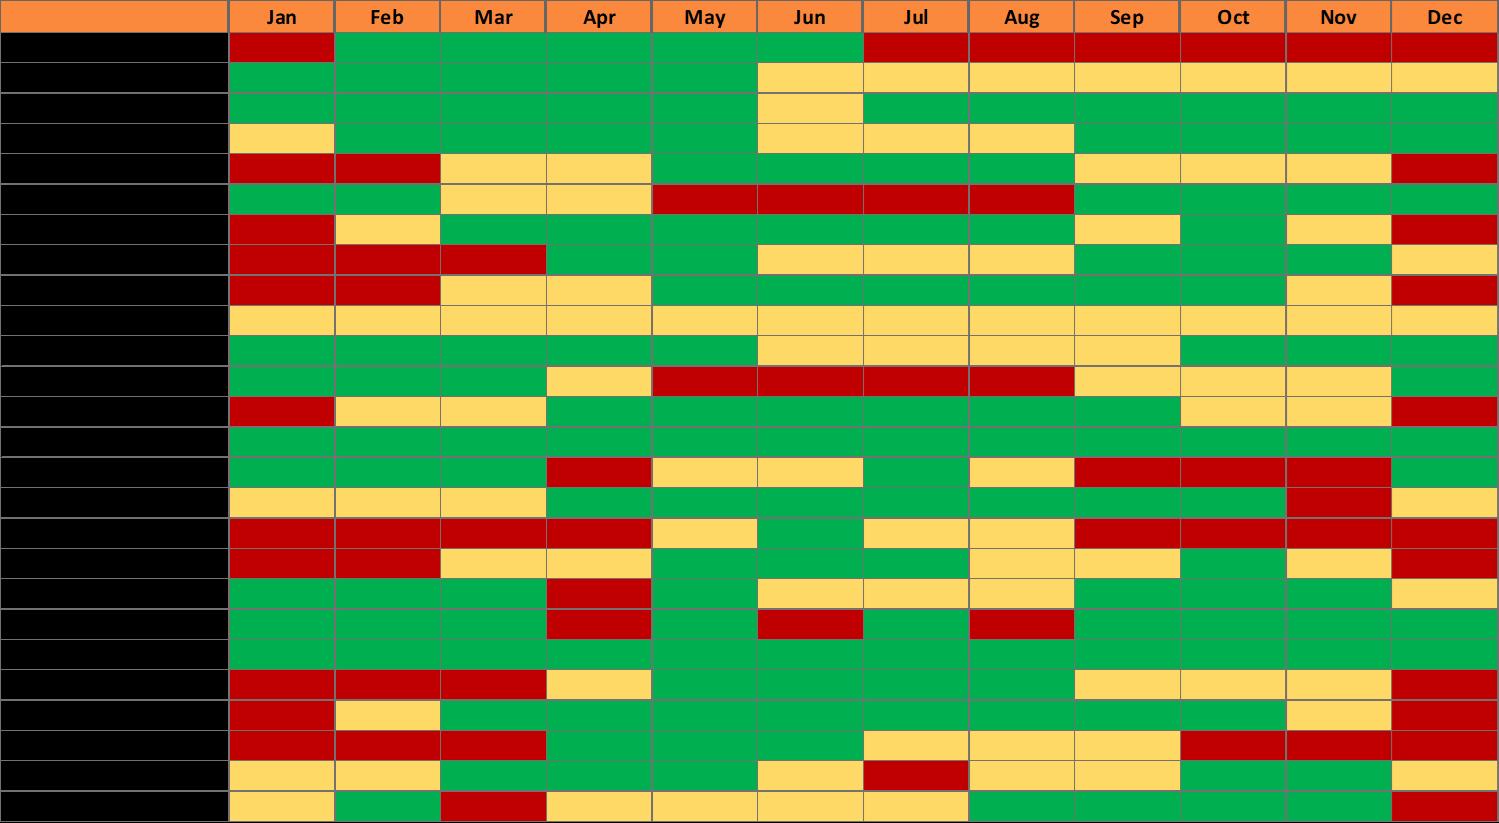 West Palm Beach Florida Fish Species Seasonality Chart